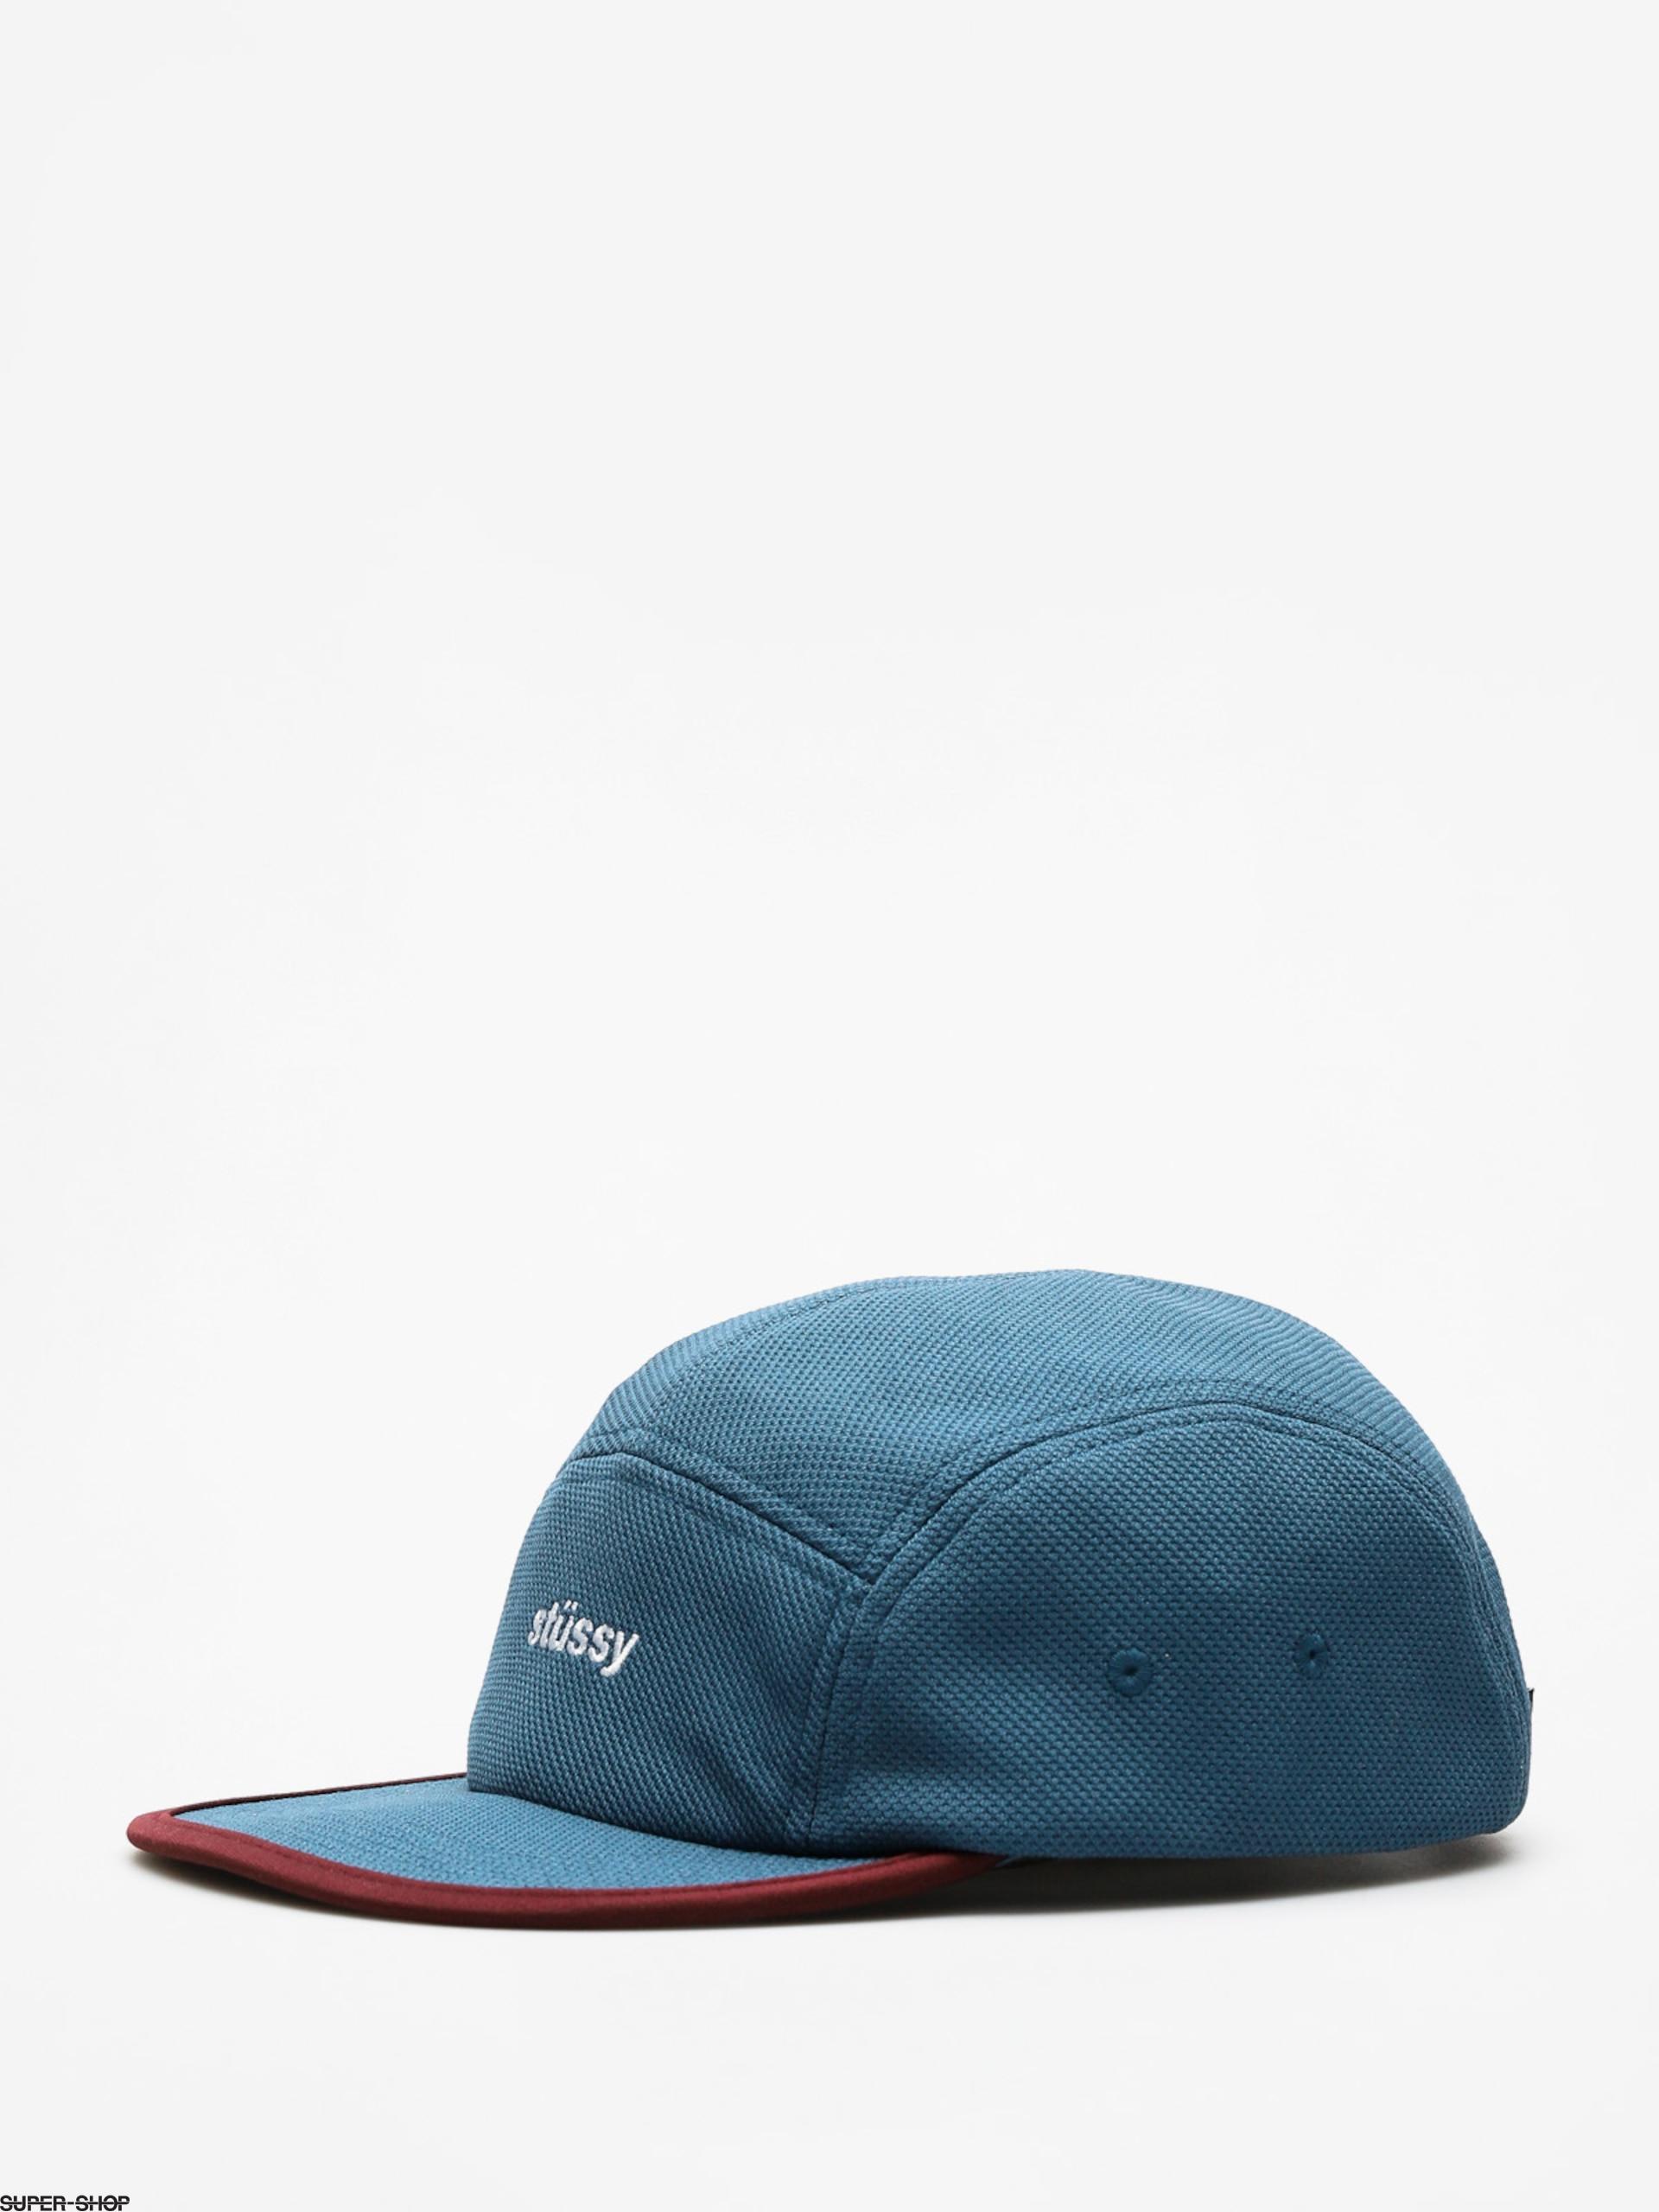 Stussy Camp Hat